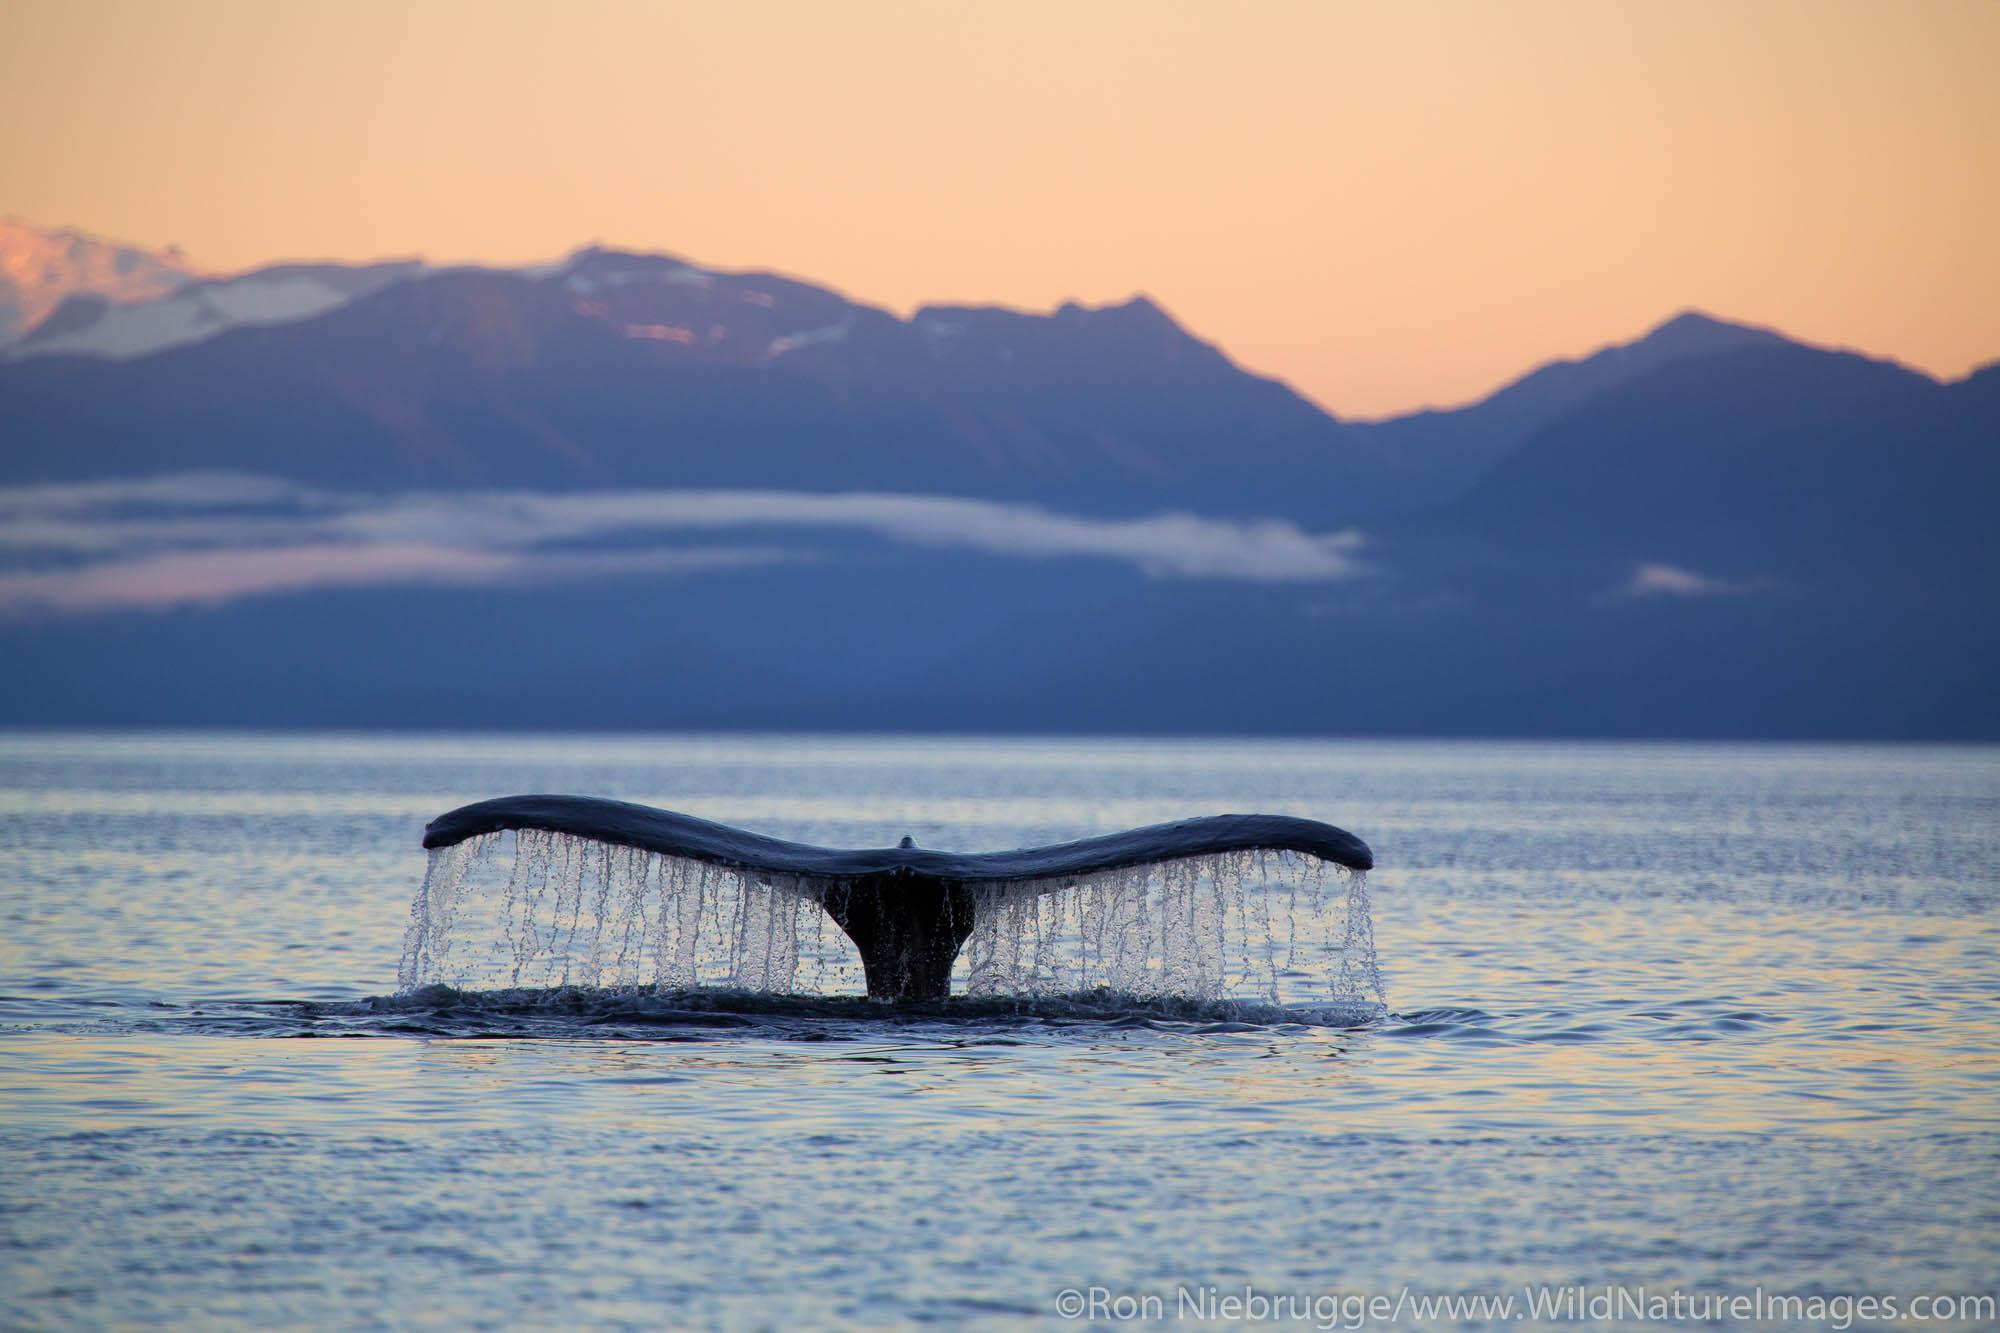 Humpback whale at sunrise, Tongass National Forest, Alaska.